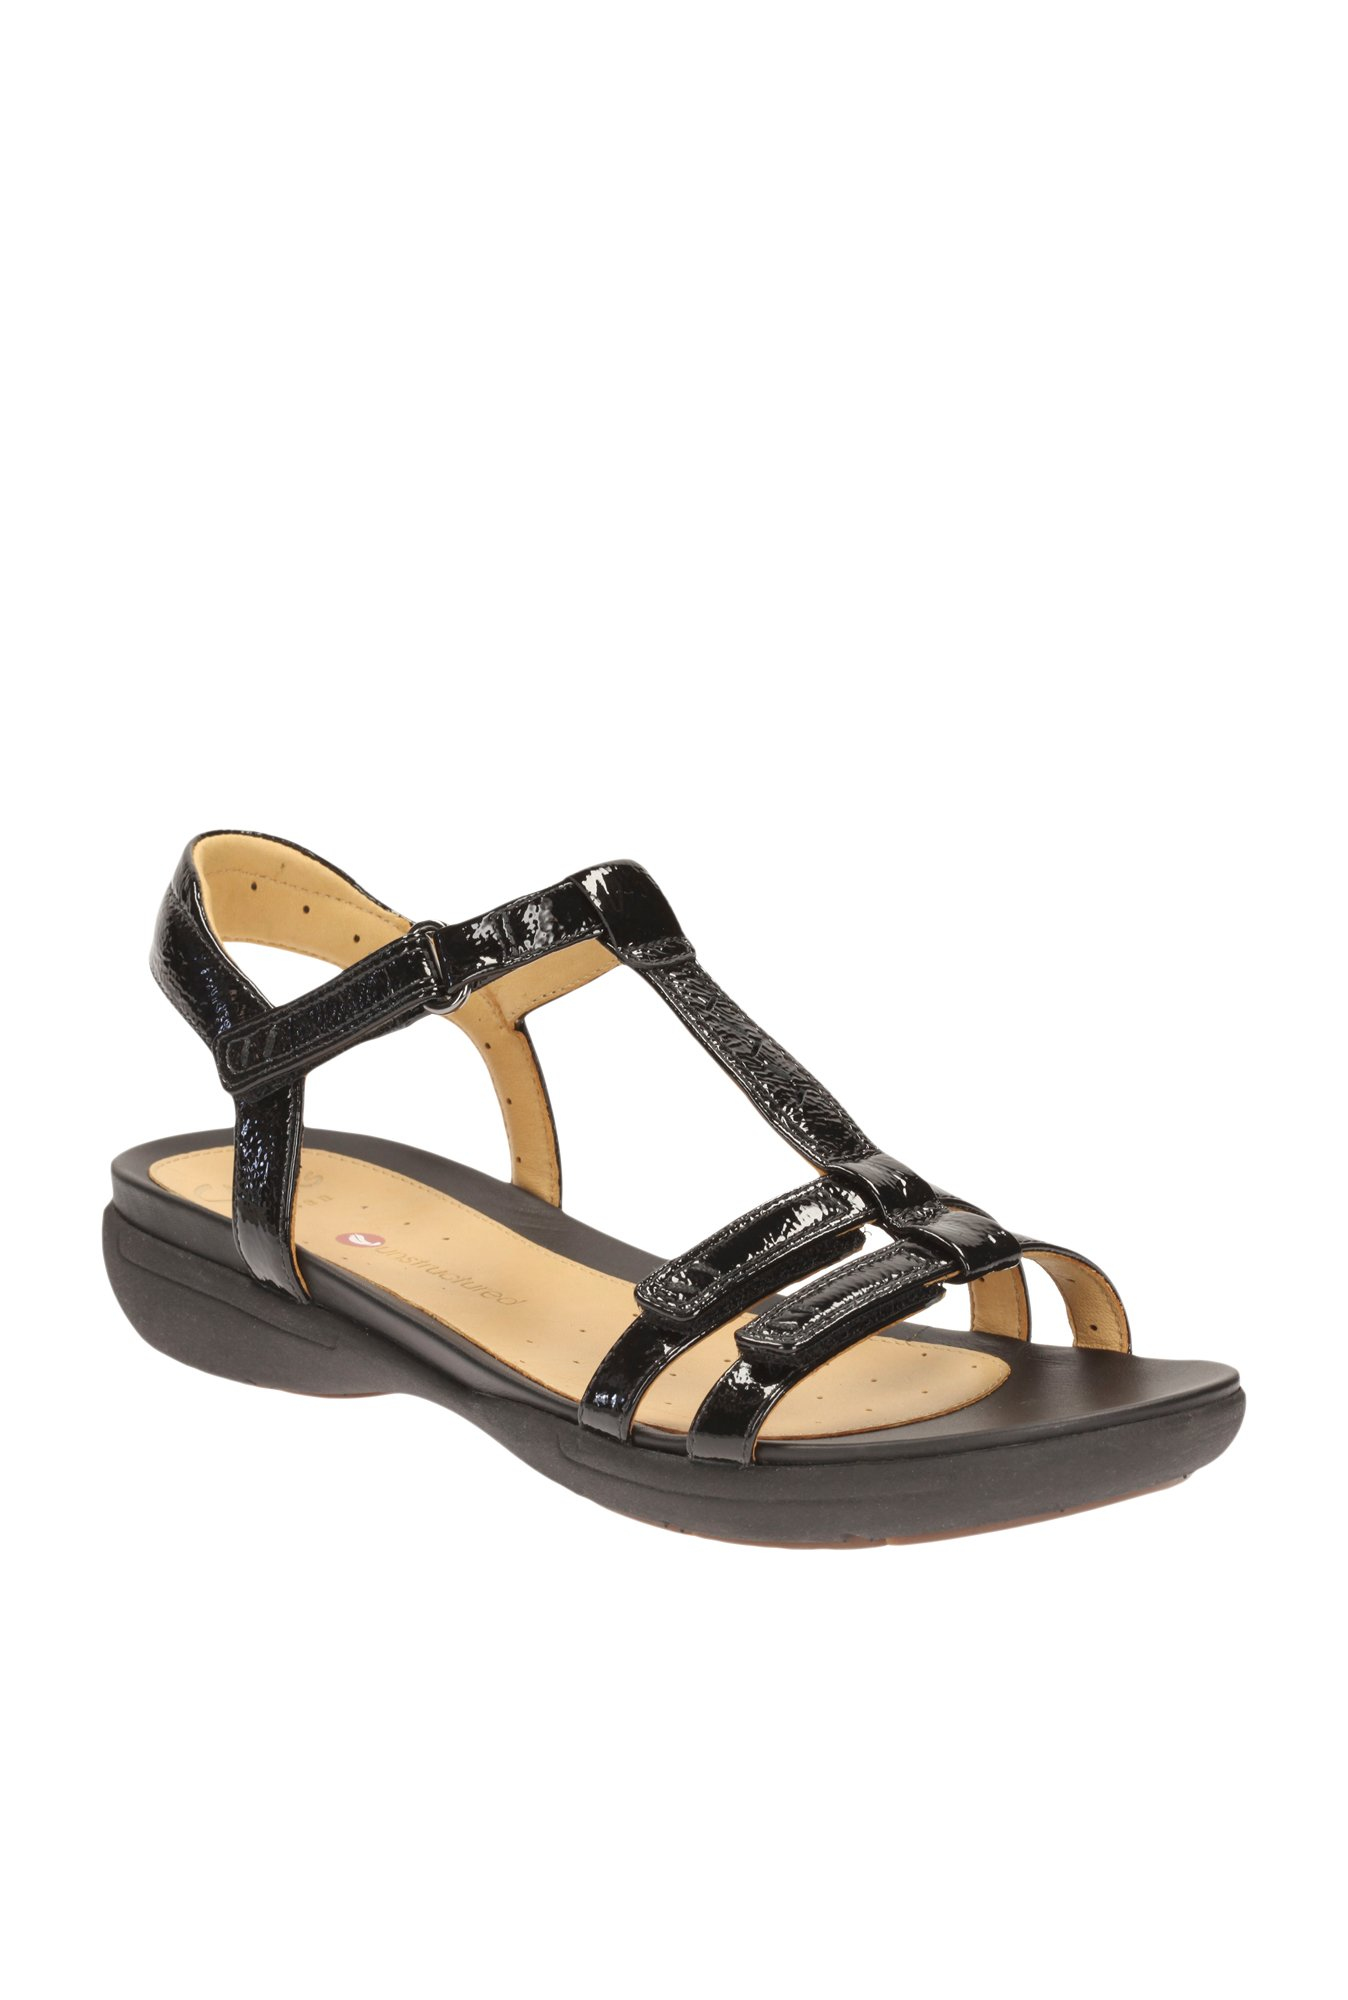 a33b9eba250 Buy Clarks Un Vaze Black T-Strap Sandals for Women at Best Price ...